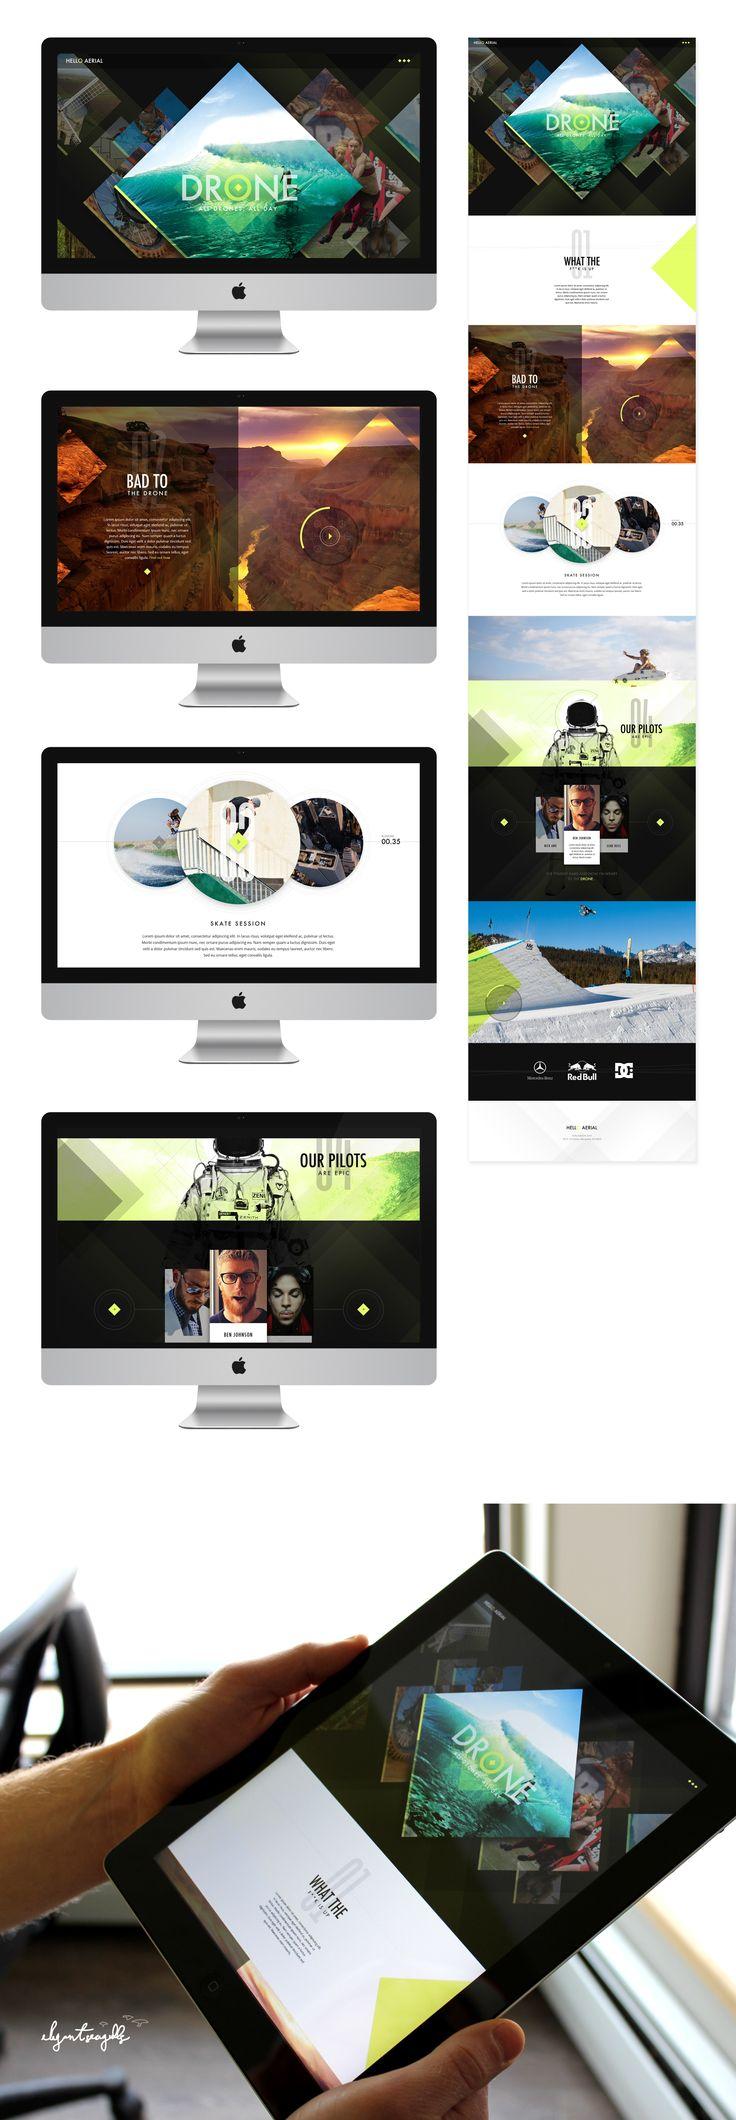 Nice digital design ;)